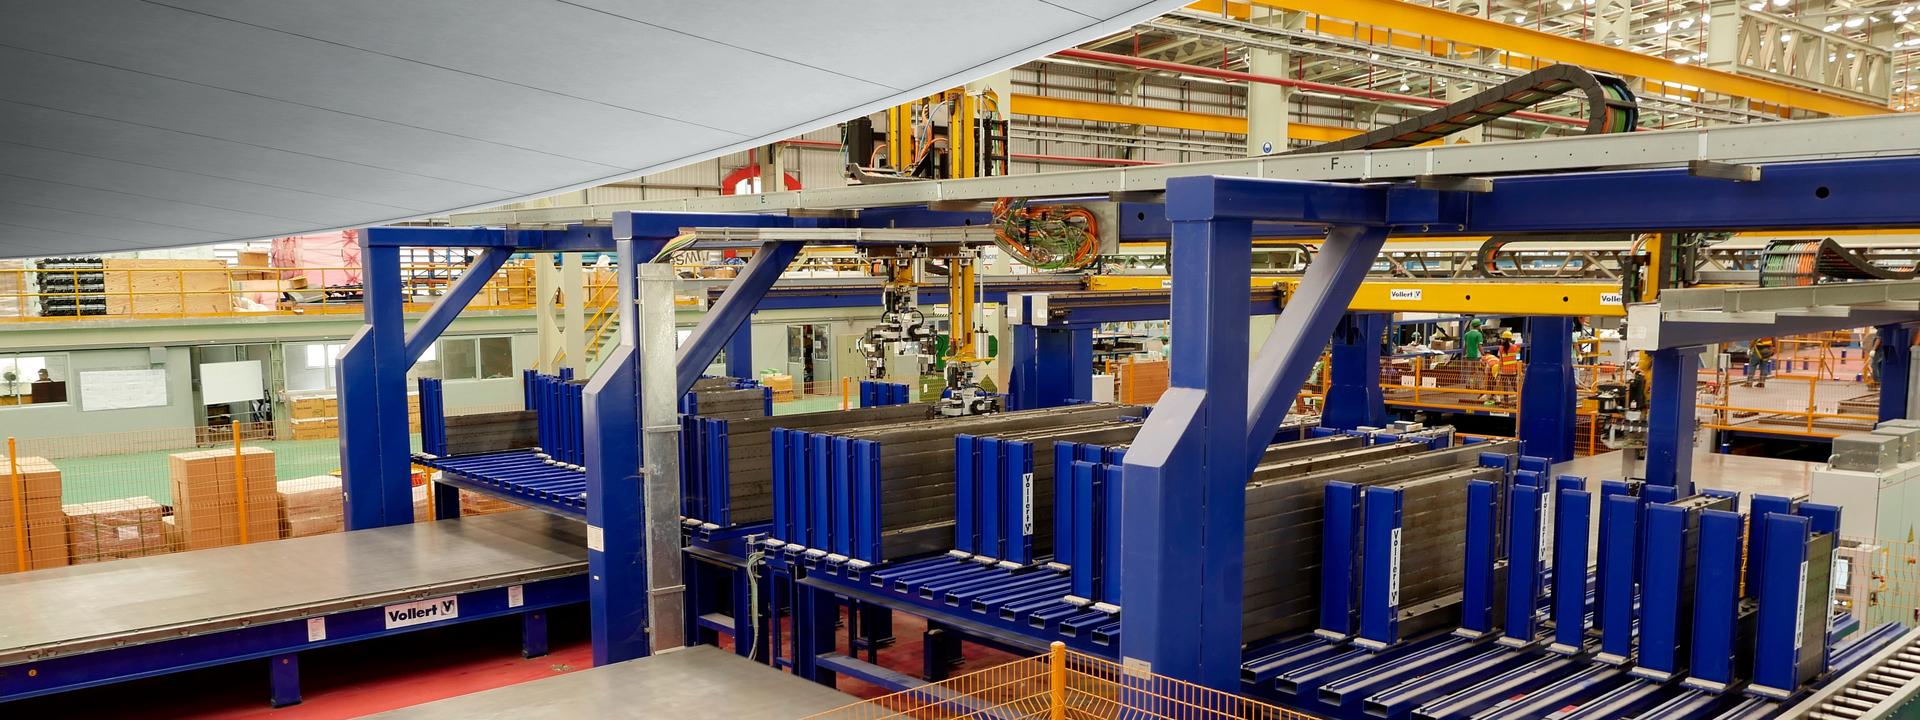 Precast concrete production | Vollert Anlagenbau GmbH